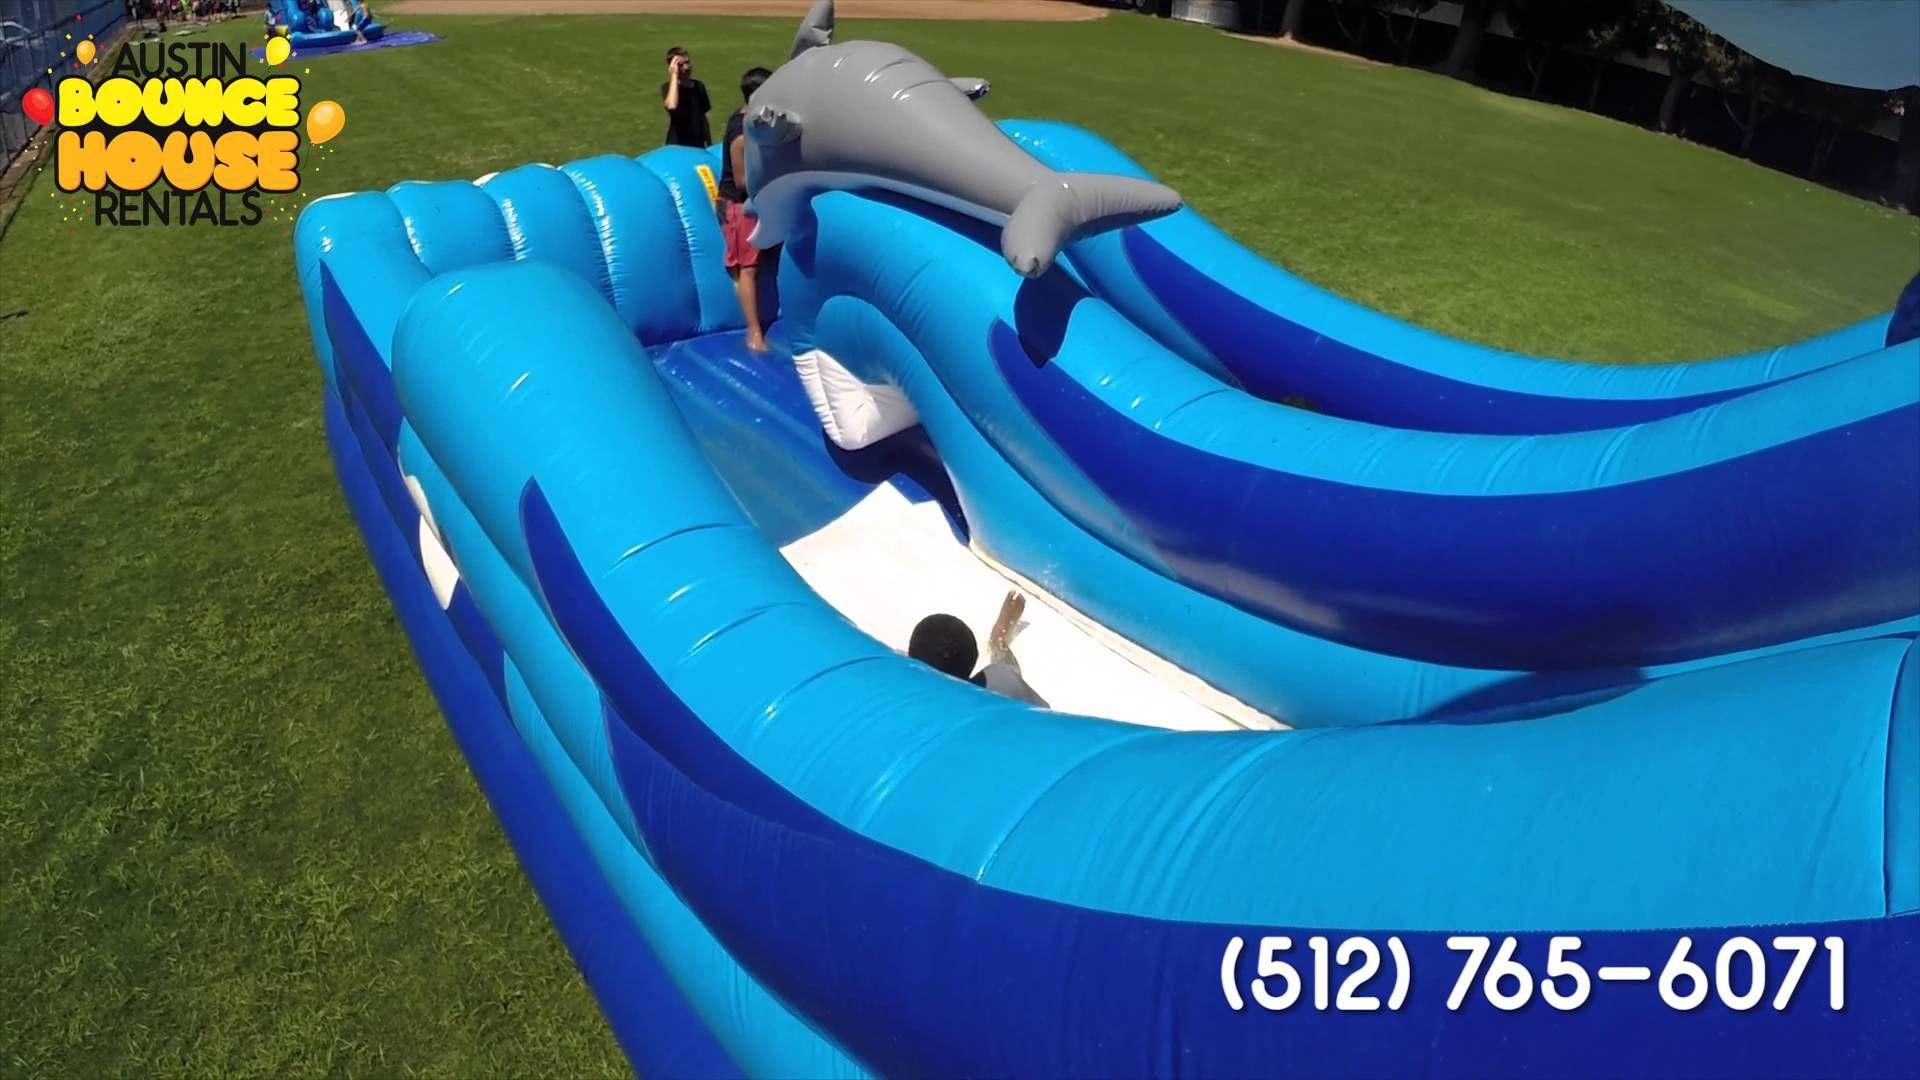 Austin bounce house rentals dolphin splash water slide